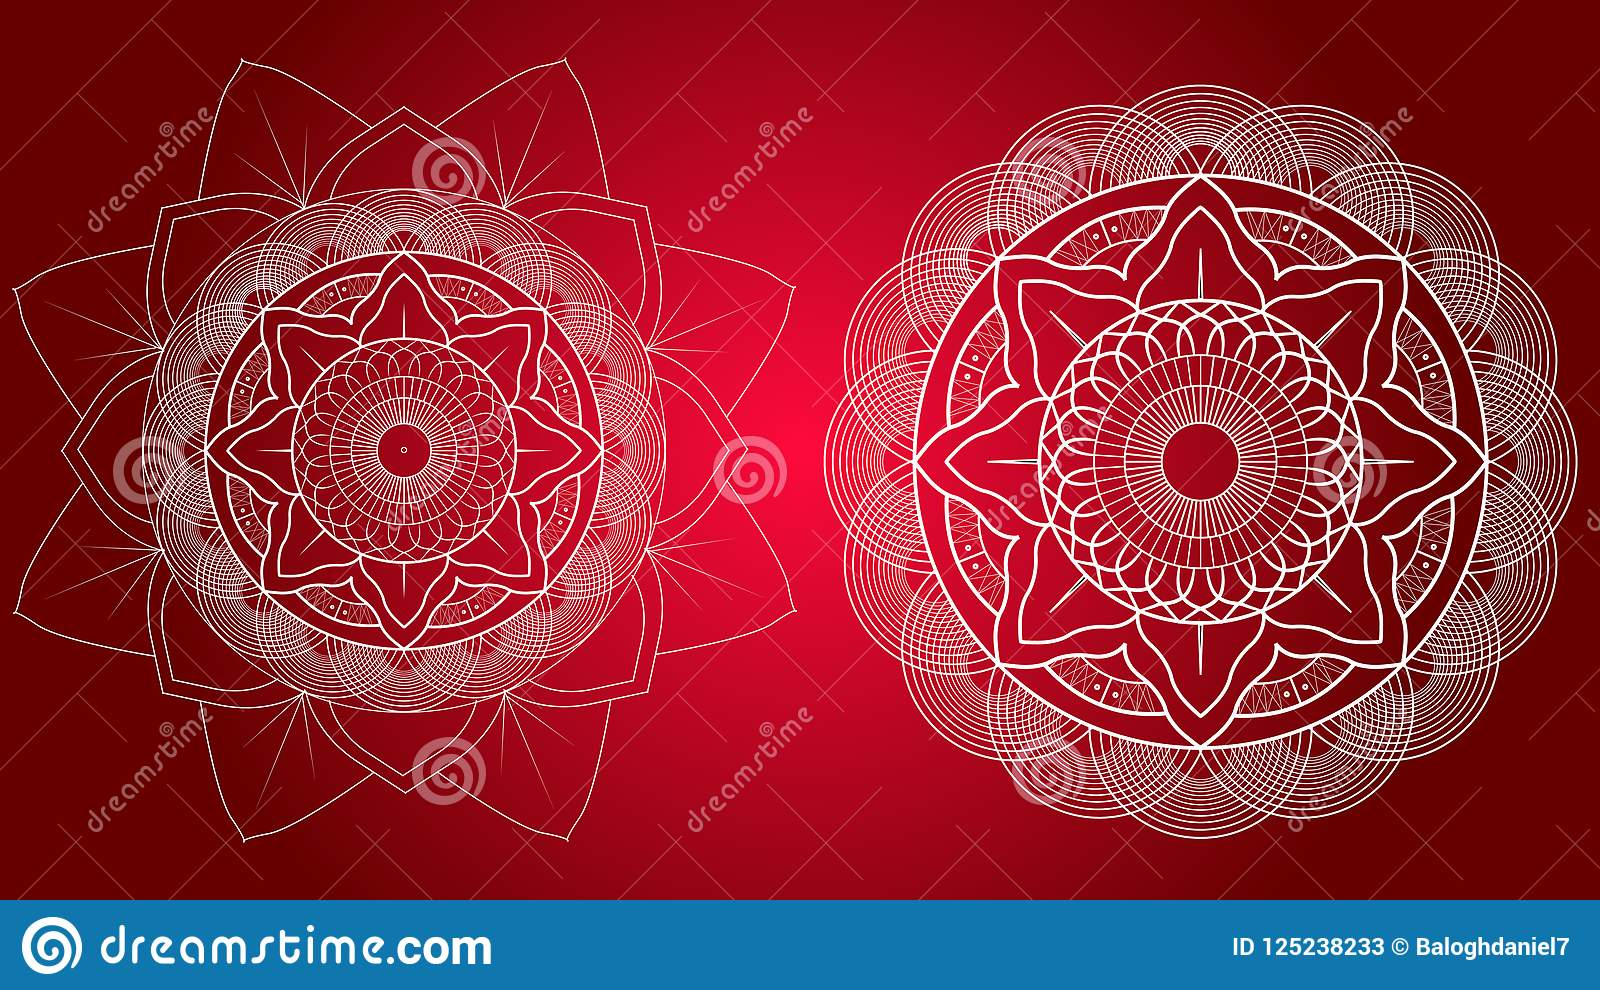 Flower Mandalas. Vintage Decorative Elements. Oriental pattern, illustration.